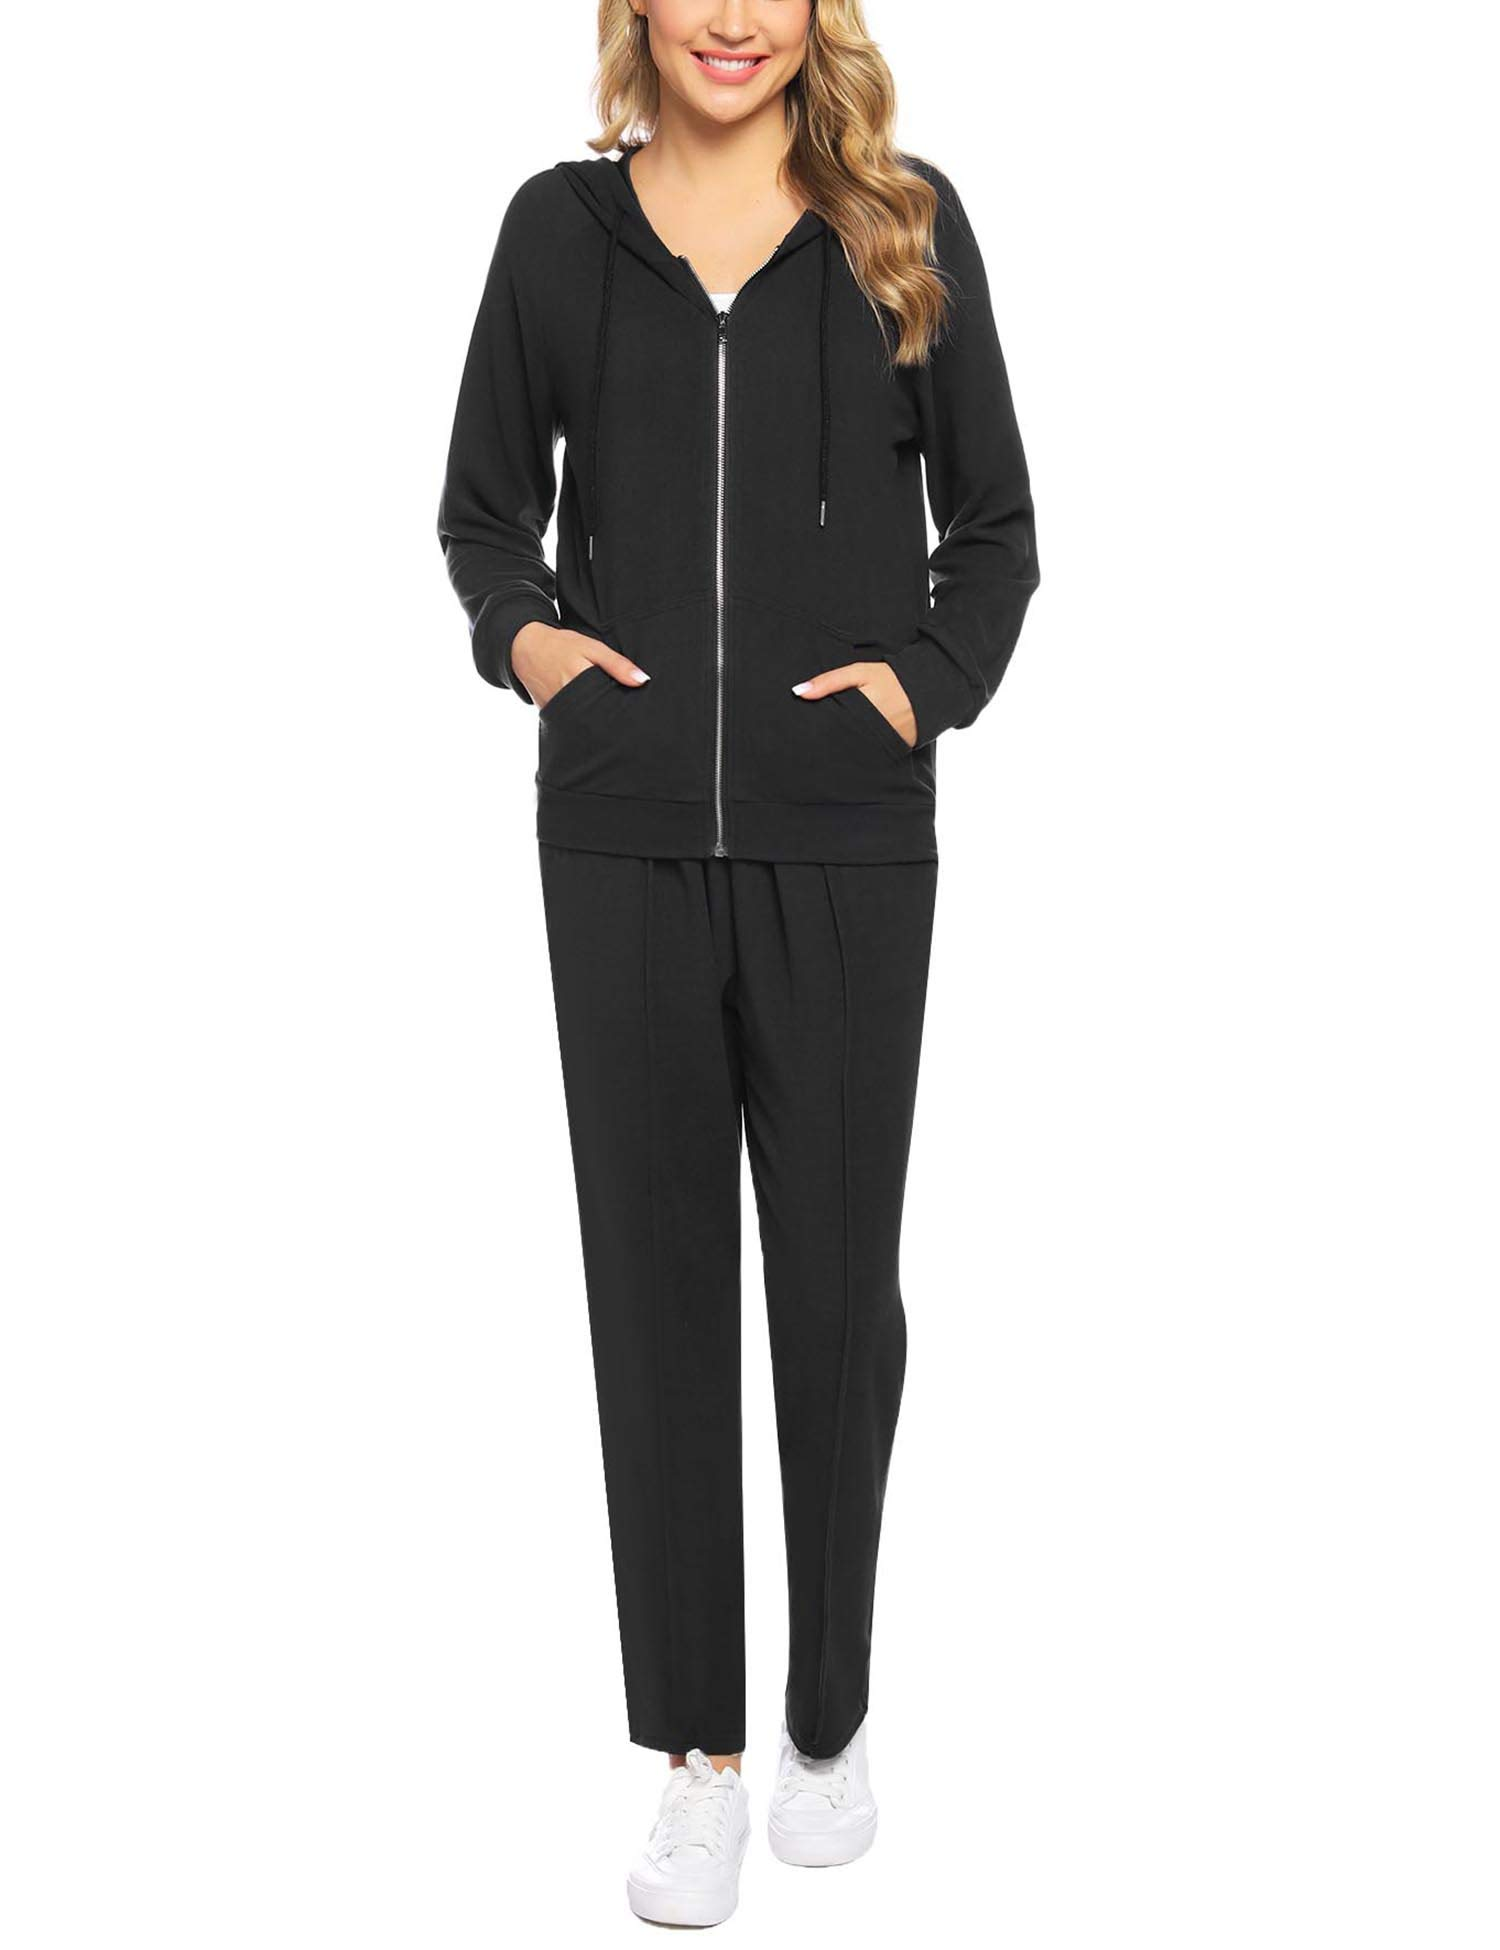 Abollria Women's 2 Piece Outfits Velvet Zip Hoodie Sweatshirt & Sweatpants Sweatsuits and Velour Tracksuit Sets Jogging Suit Black by Abollria